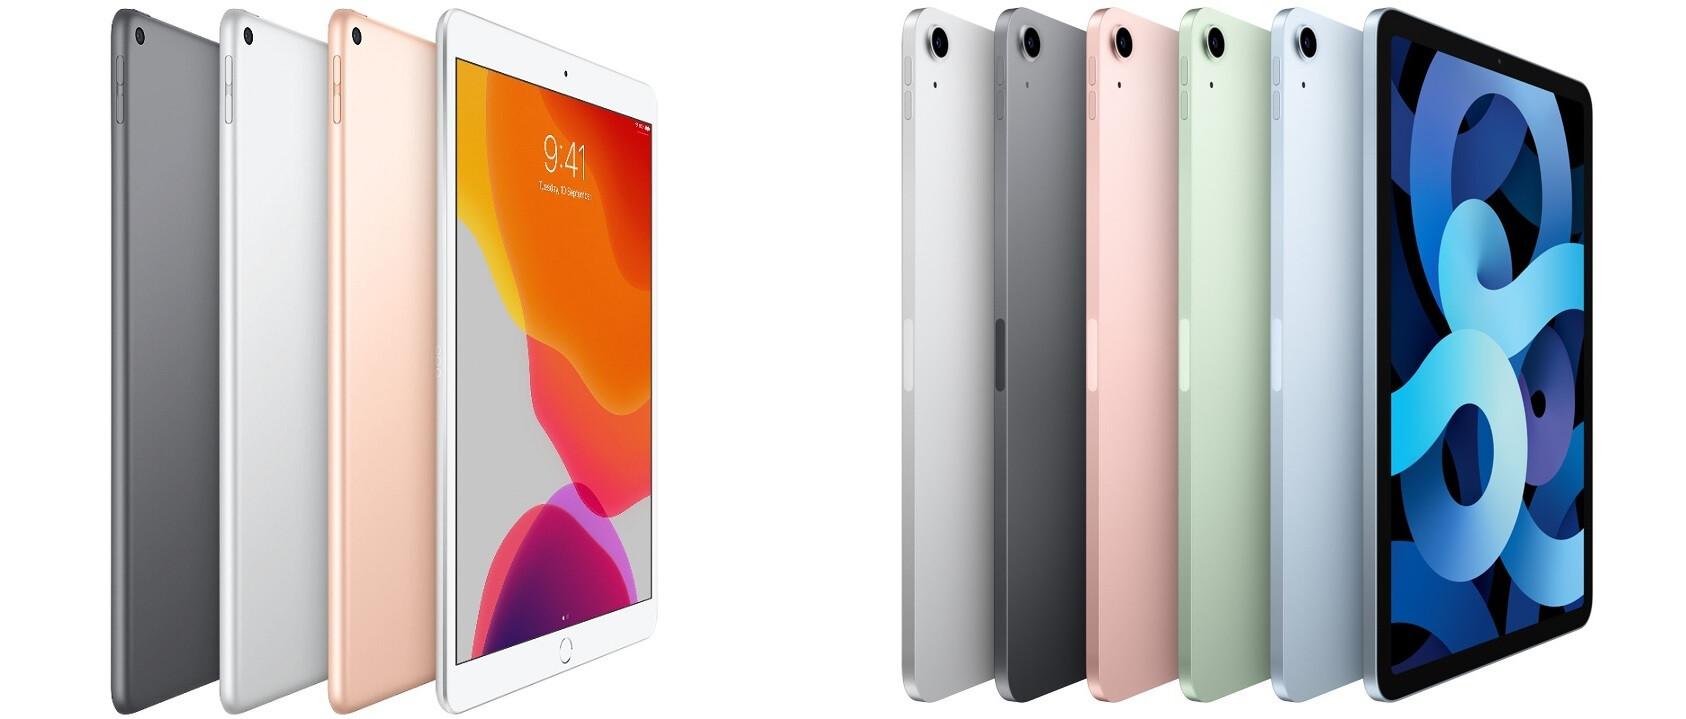 Apple iPad Air 4 vs iPad Air 3: Should you upgrade? - PhoneArena